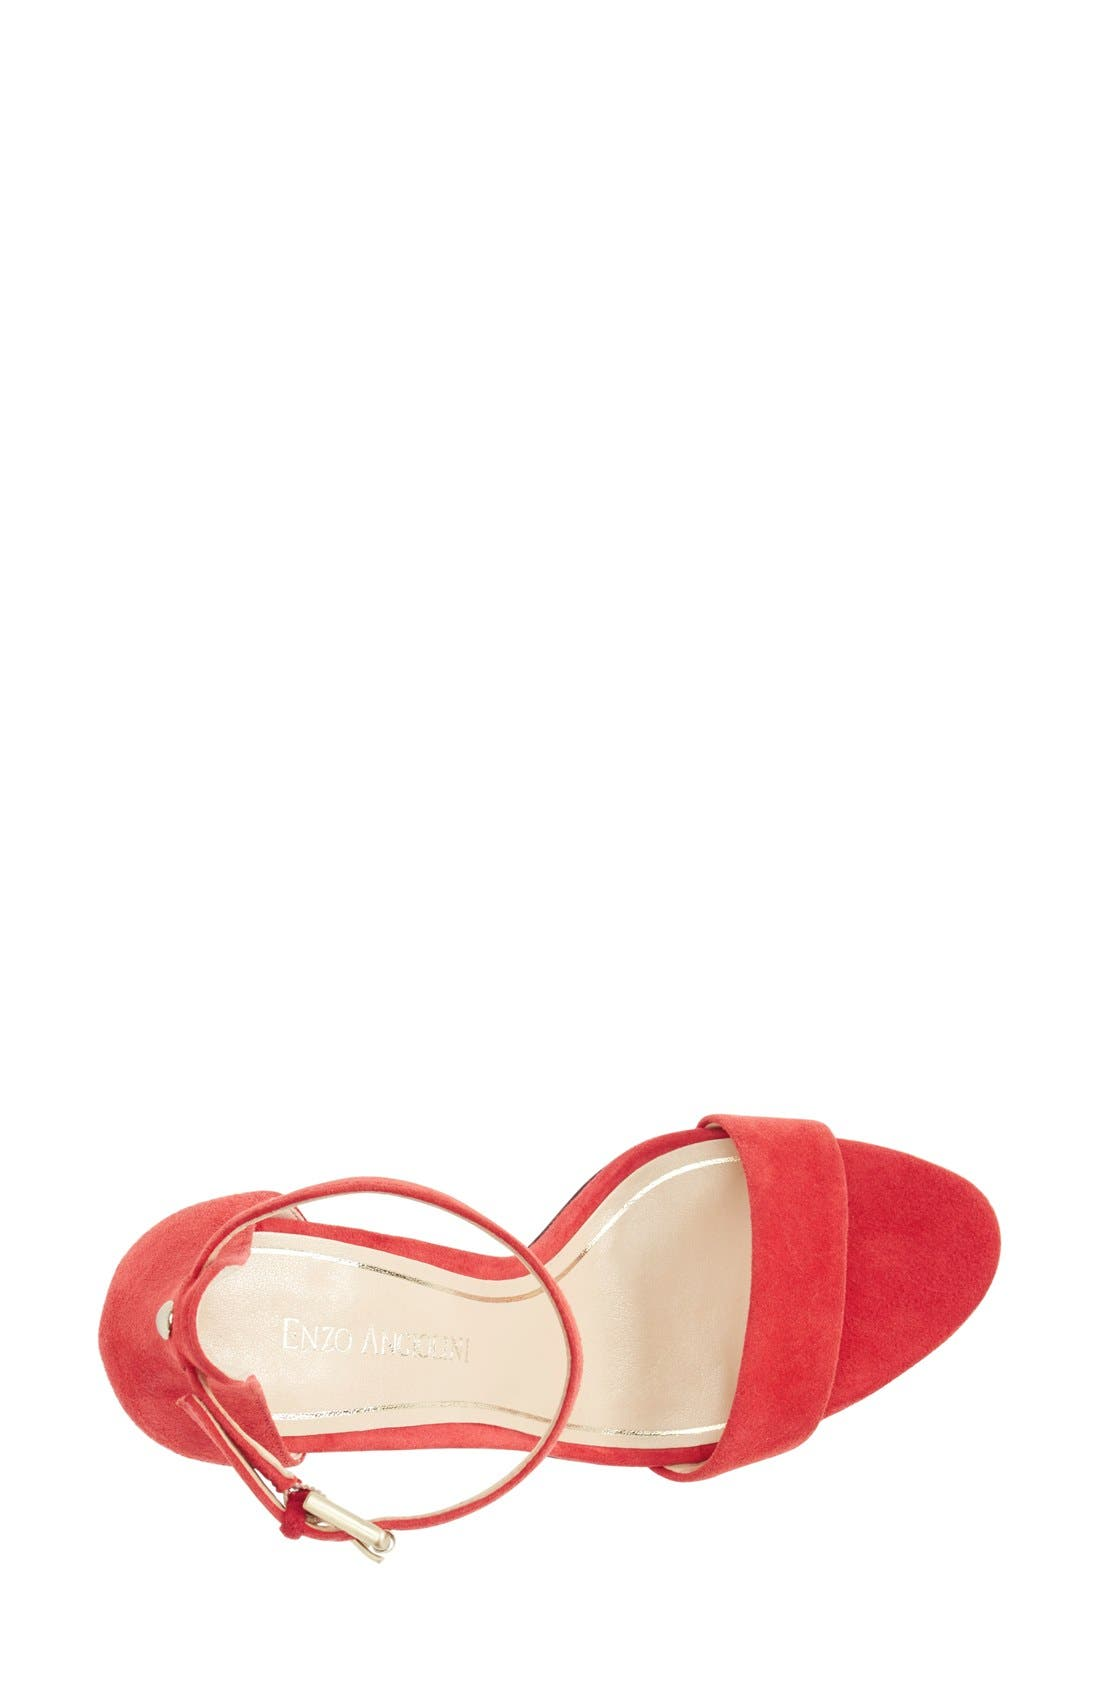 Alternate Image 3  - Enzo Angiolini 'Manna' Ankle Strap Sandal (Women)